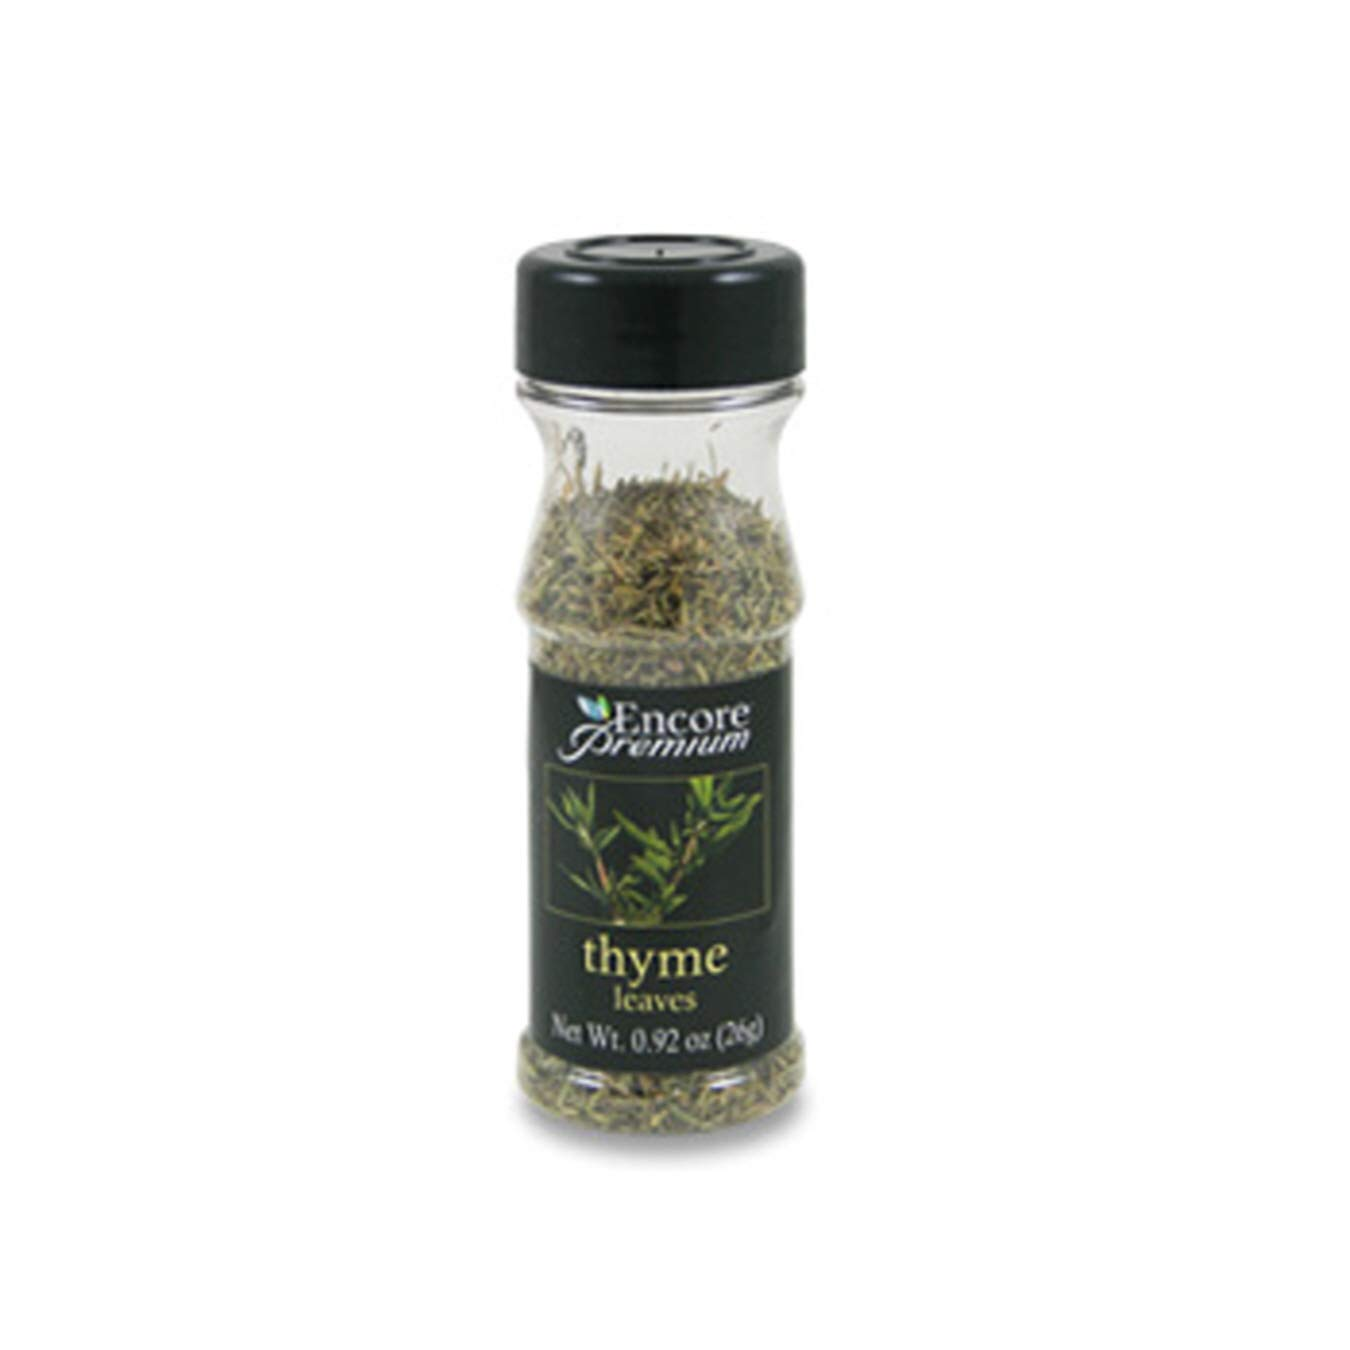 (Pack of 12) Encore Premium Thyme Leaves, 0.92oz